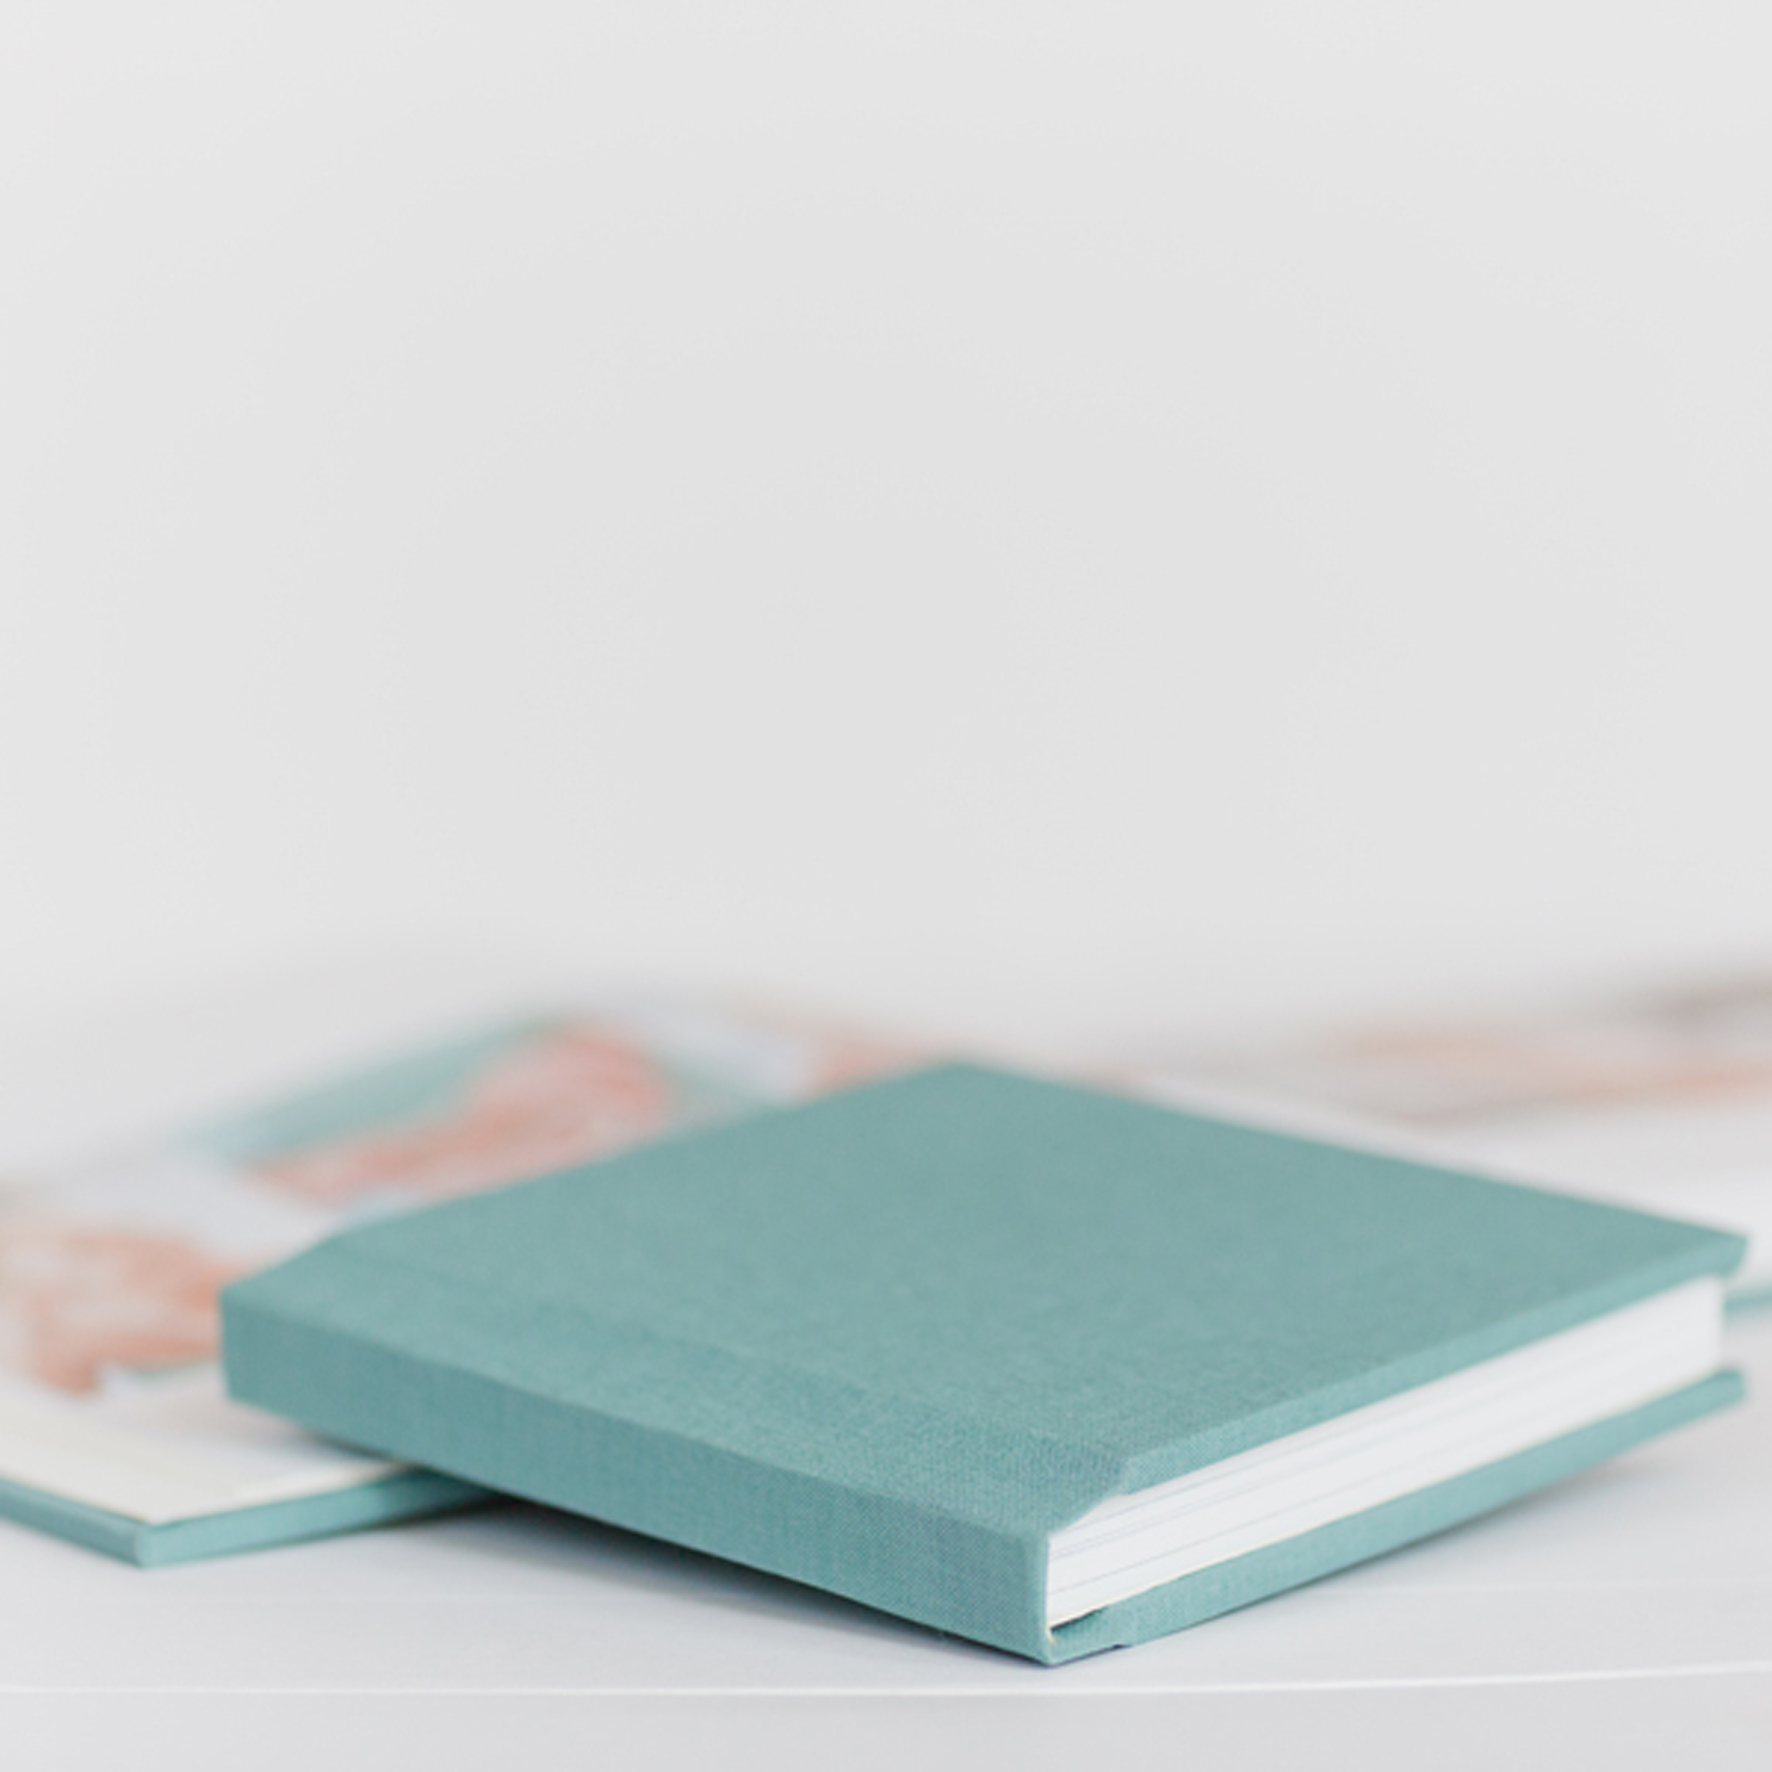 007Carla&MerlinBookssq.jpg